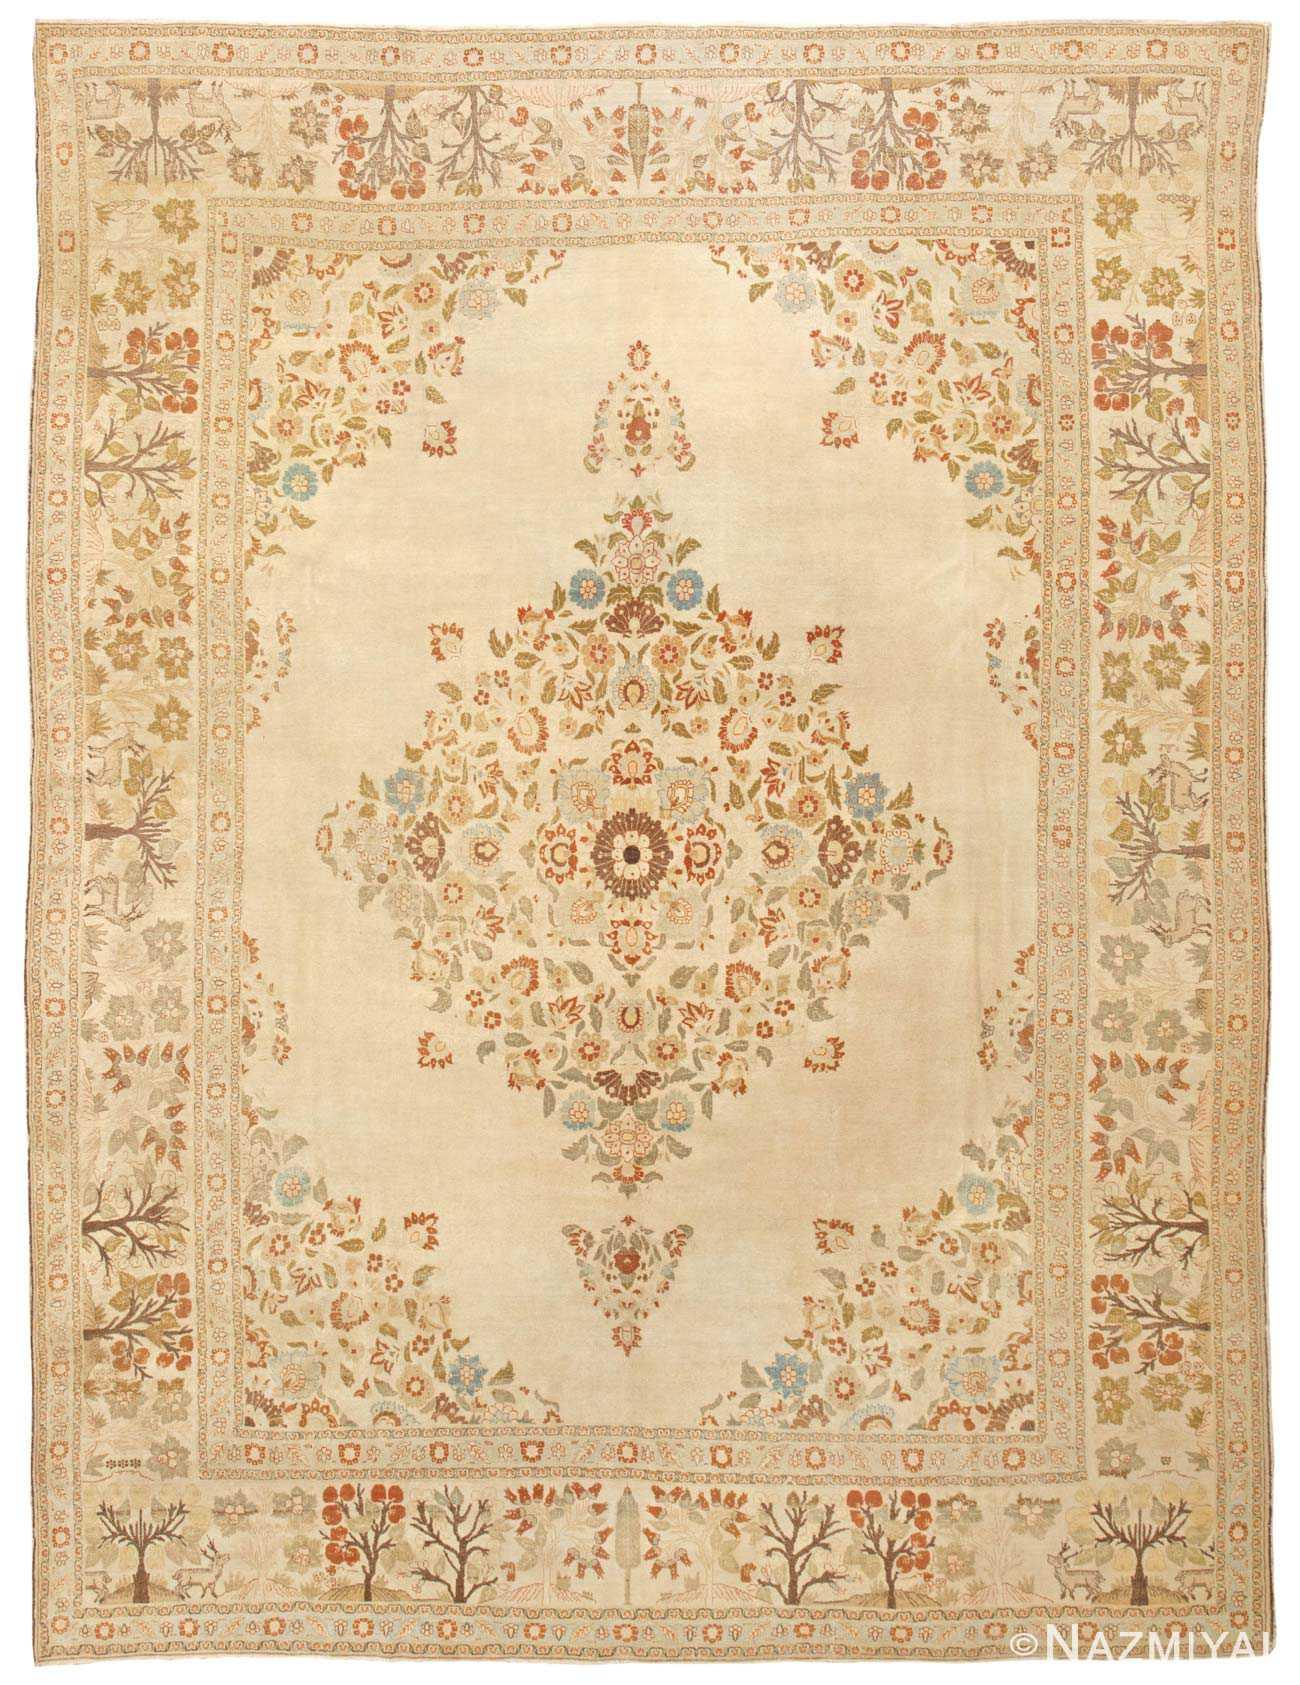 Antique Tabriz Persian Rug 45088 Detail/Large View